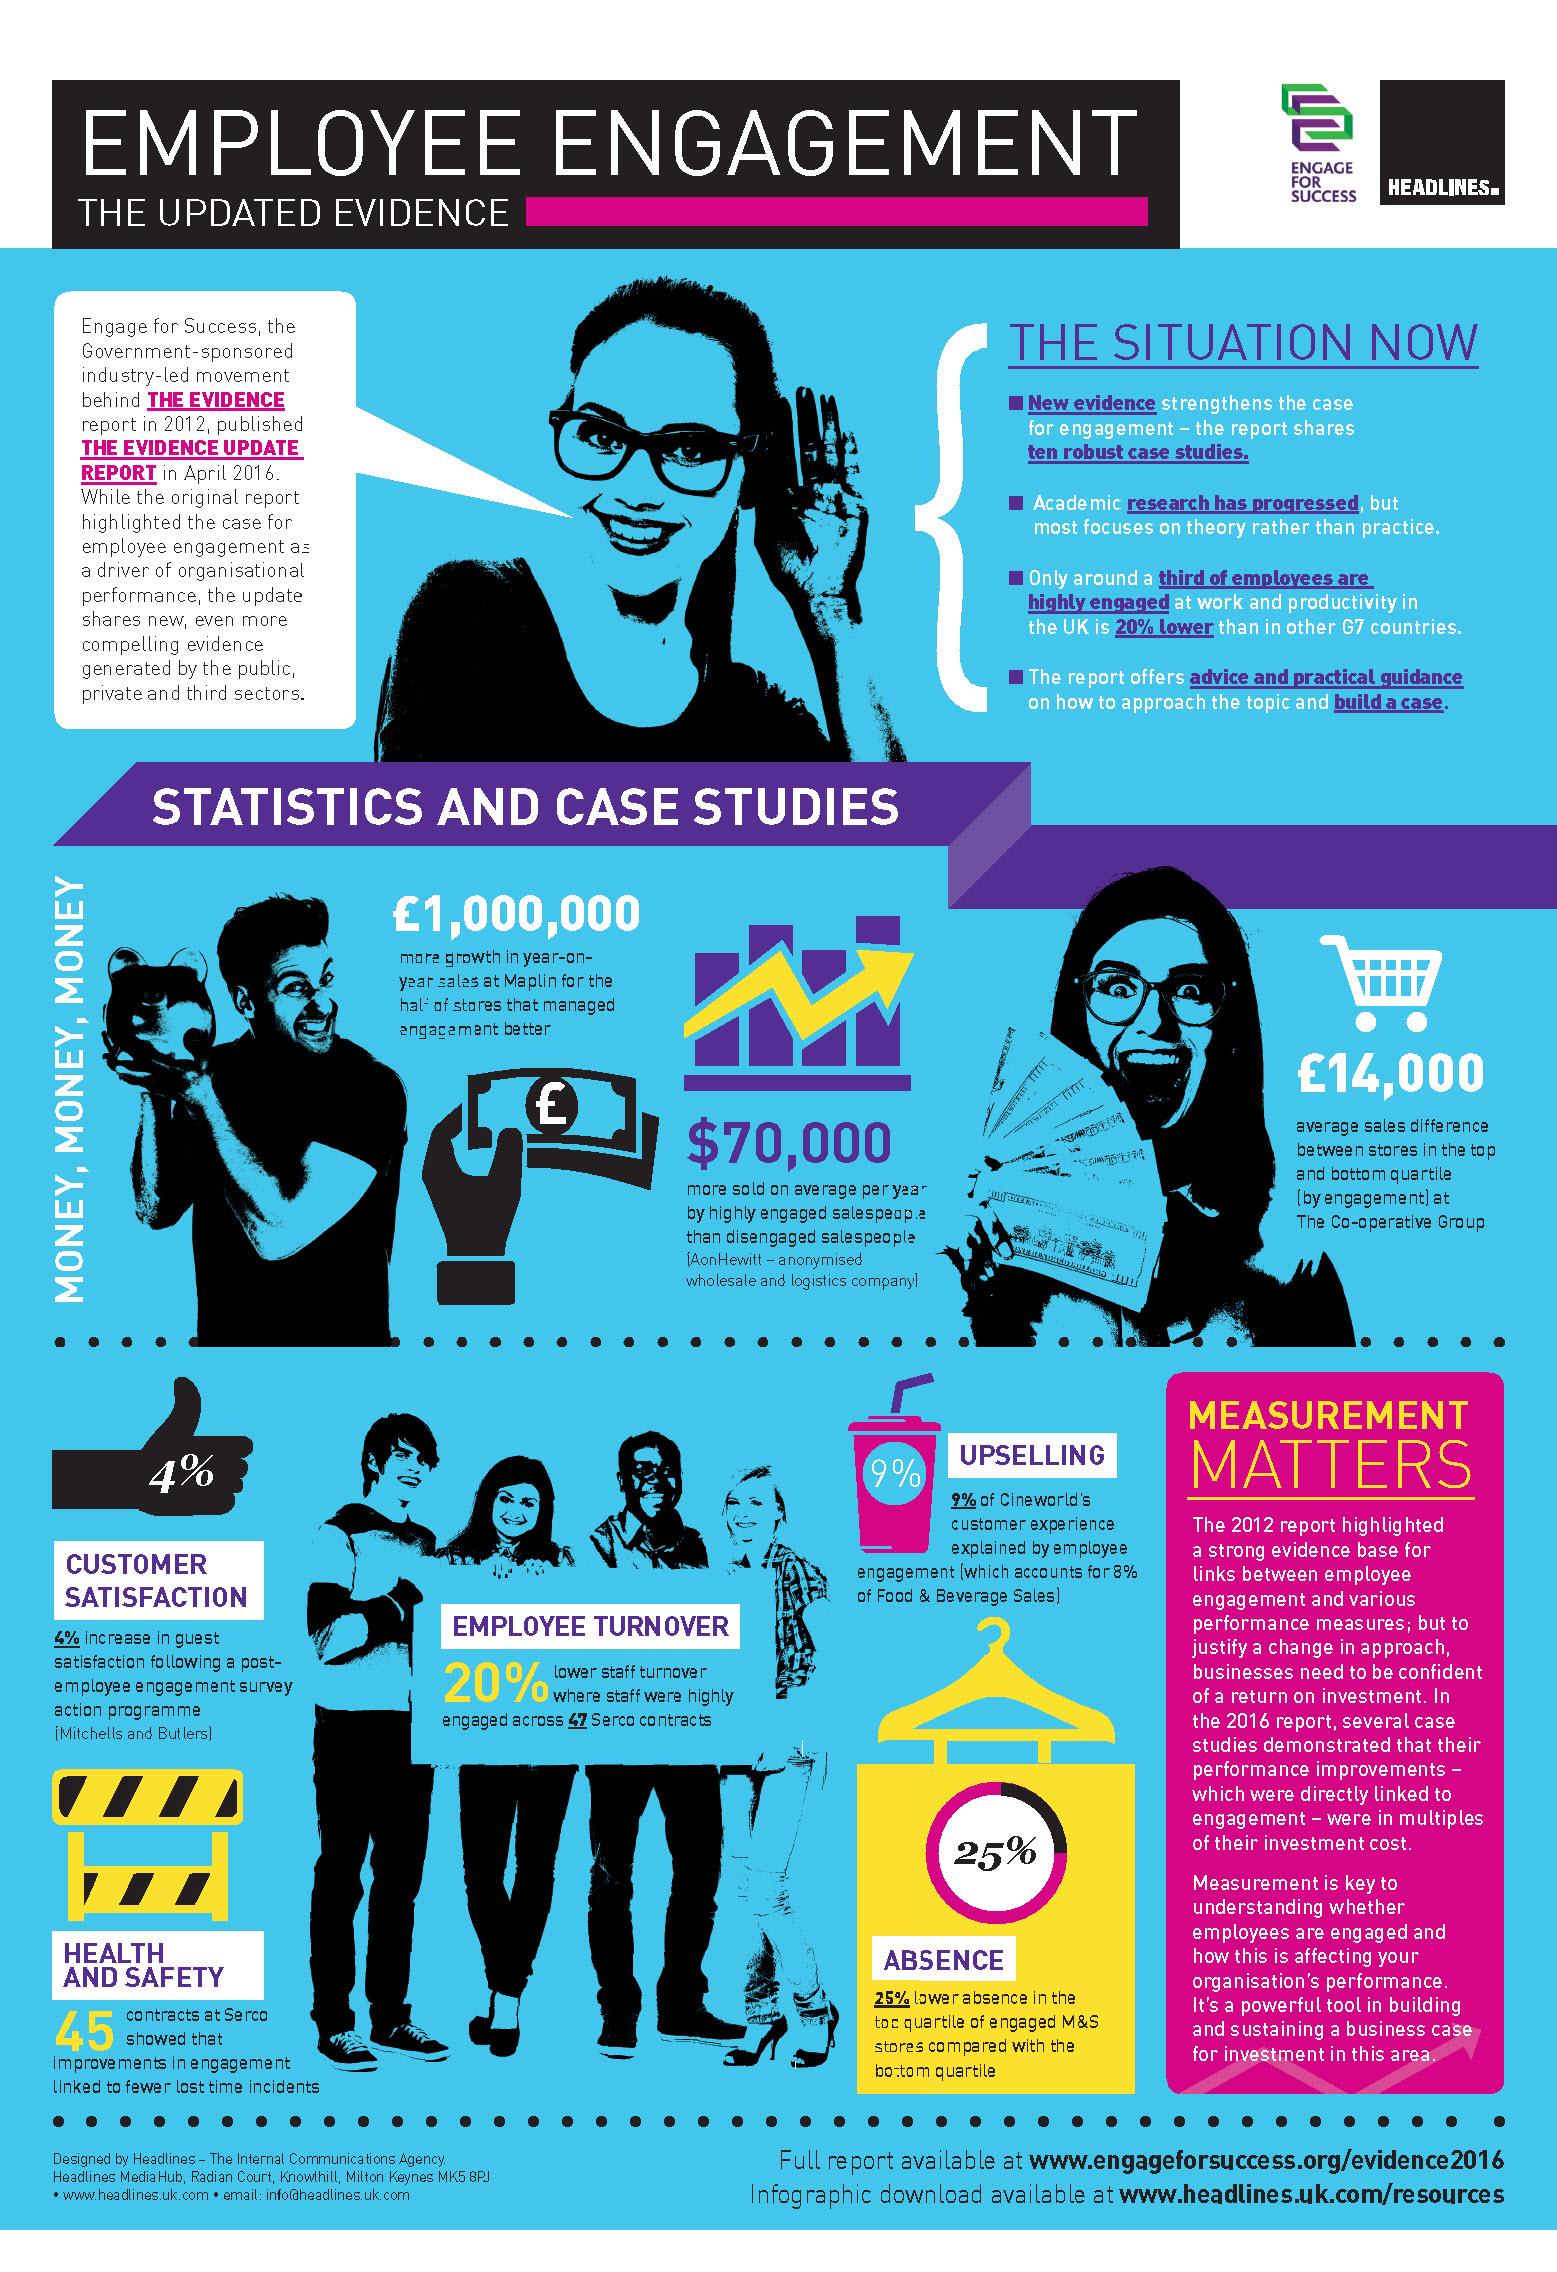 employee engagement case studies uk